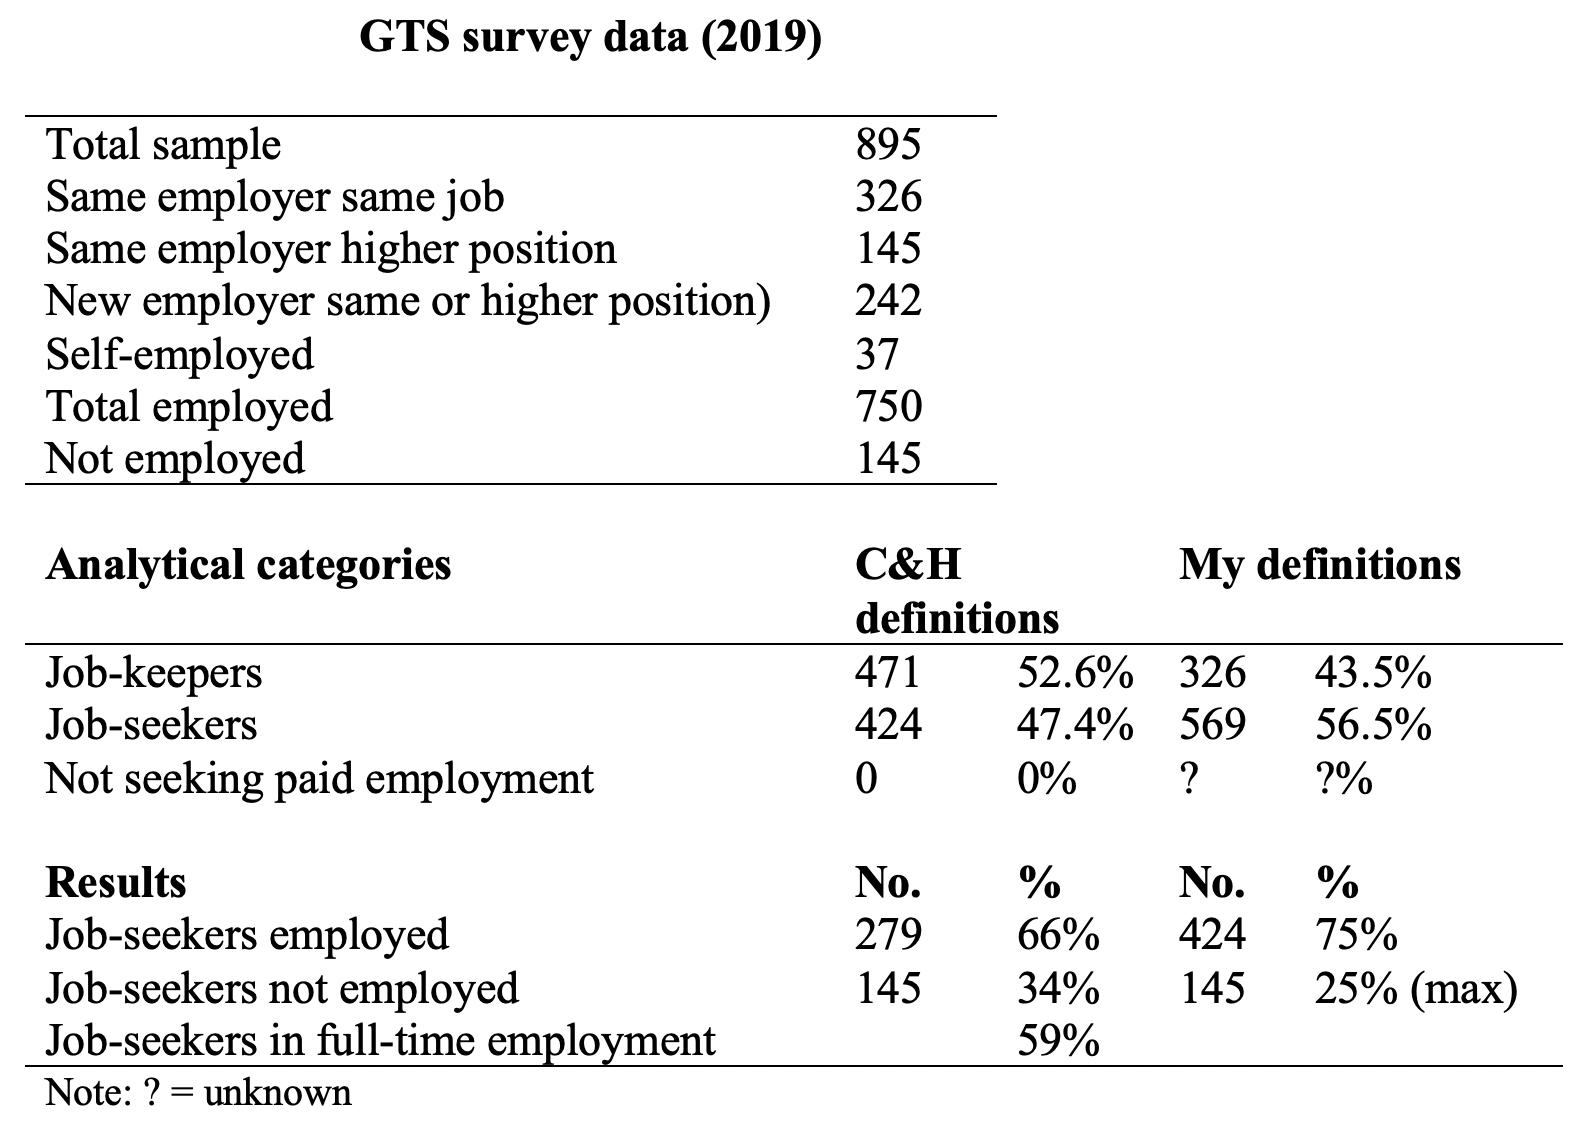 Table 1: GTS survey data (2019)